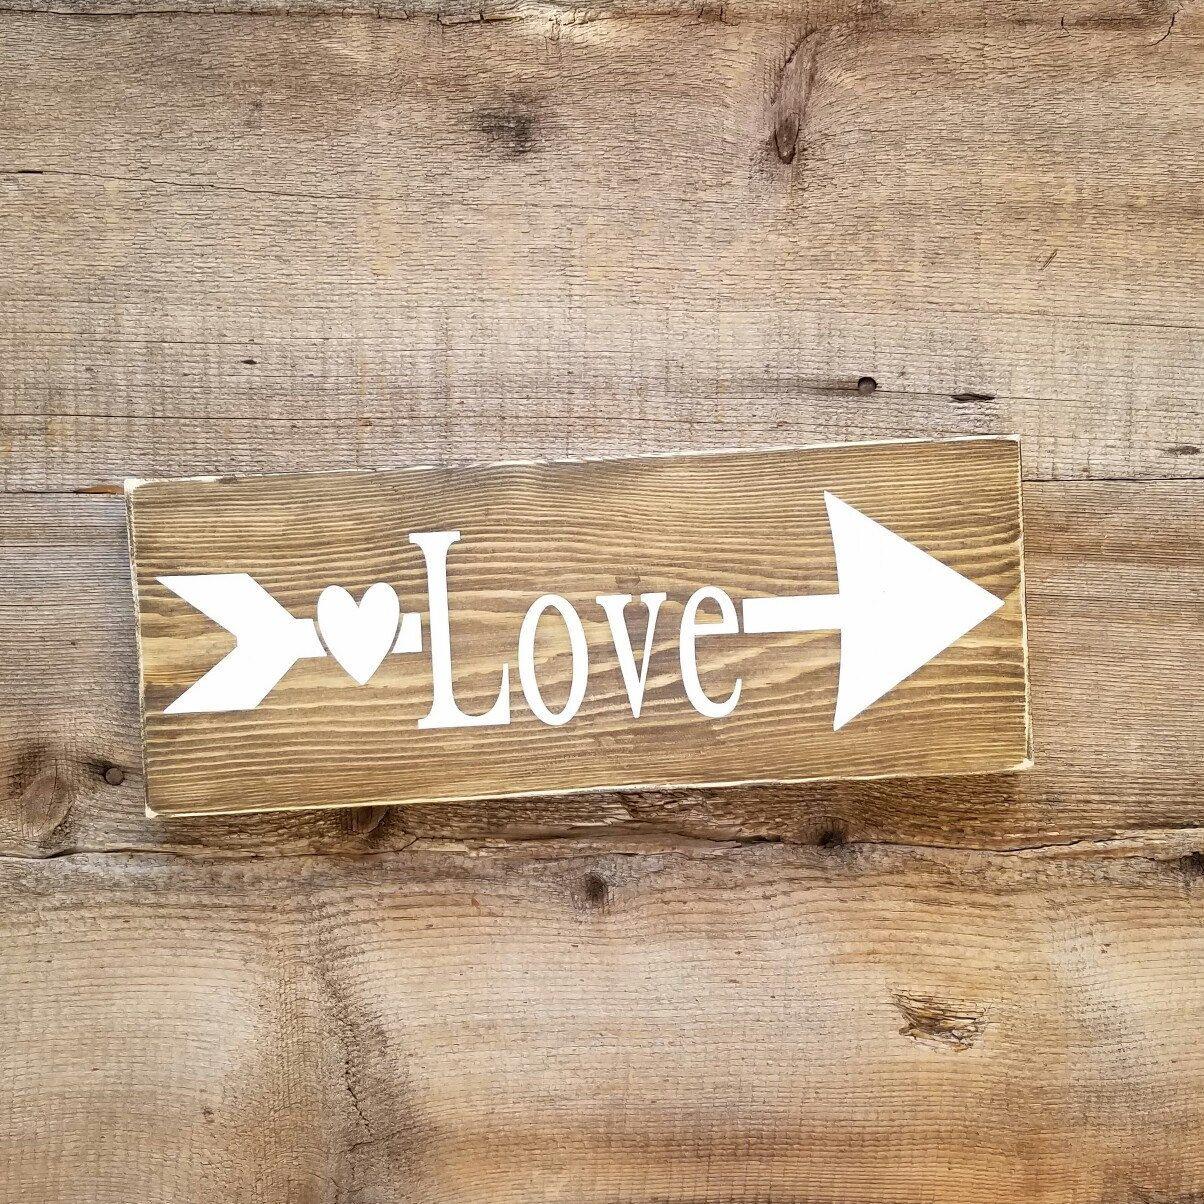 Love Decor Signs Impressive Love Wood Signlove Wooden Sign Arrow Wooden Sign Rustic Design Decoration